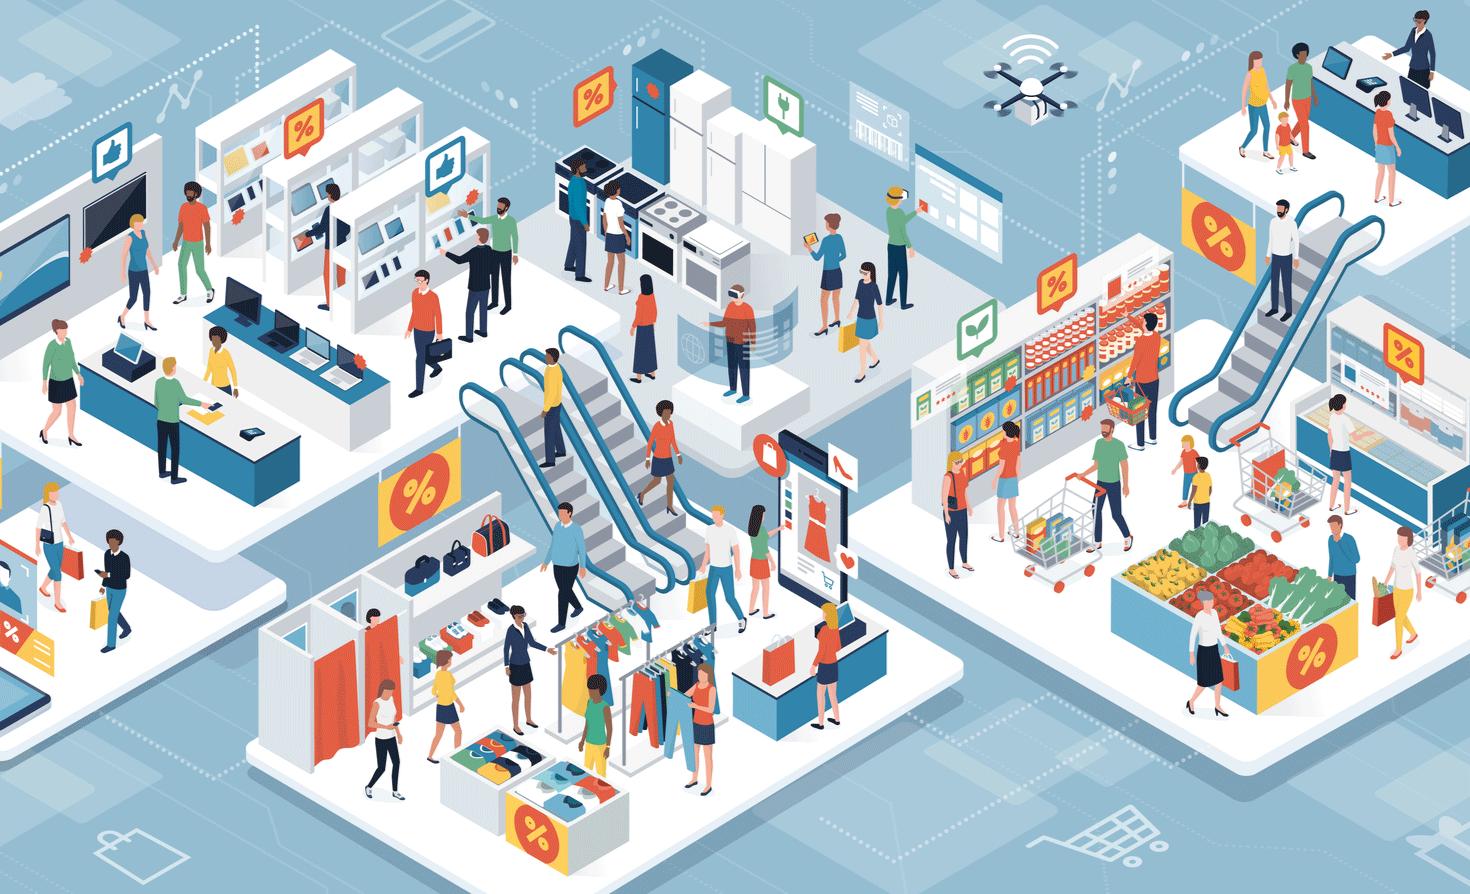 5 trends defining the future of retail | Greenbiz